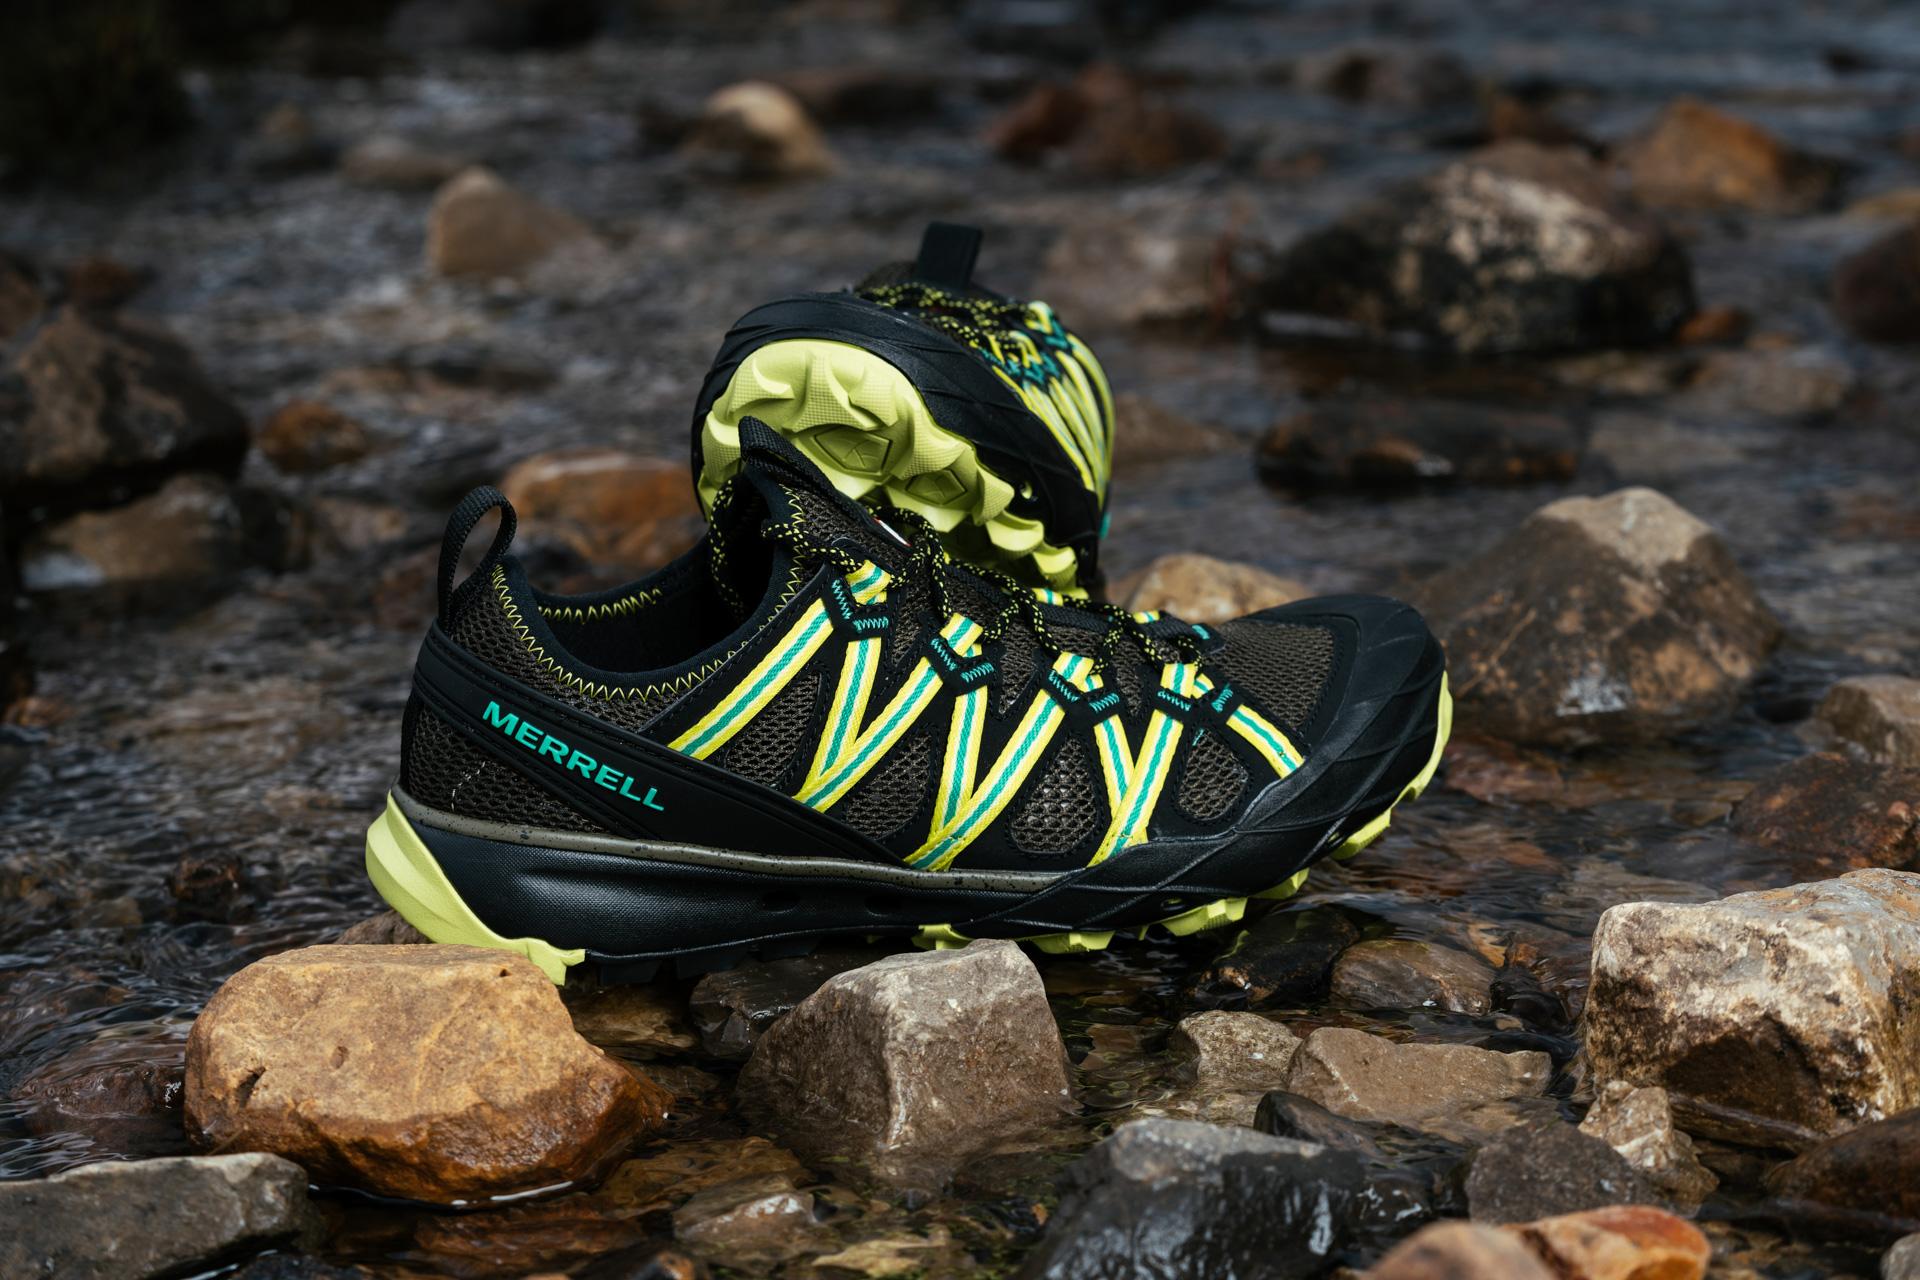 Merrell Choprock Trail Shoe | Review